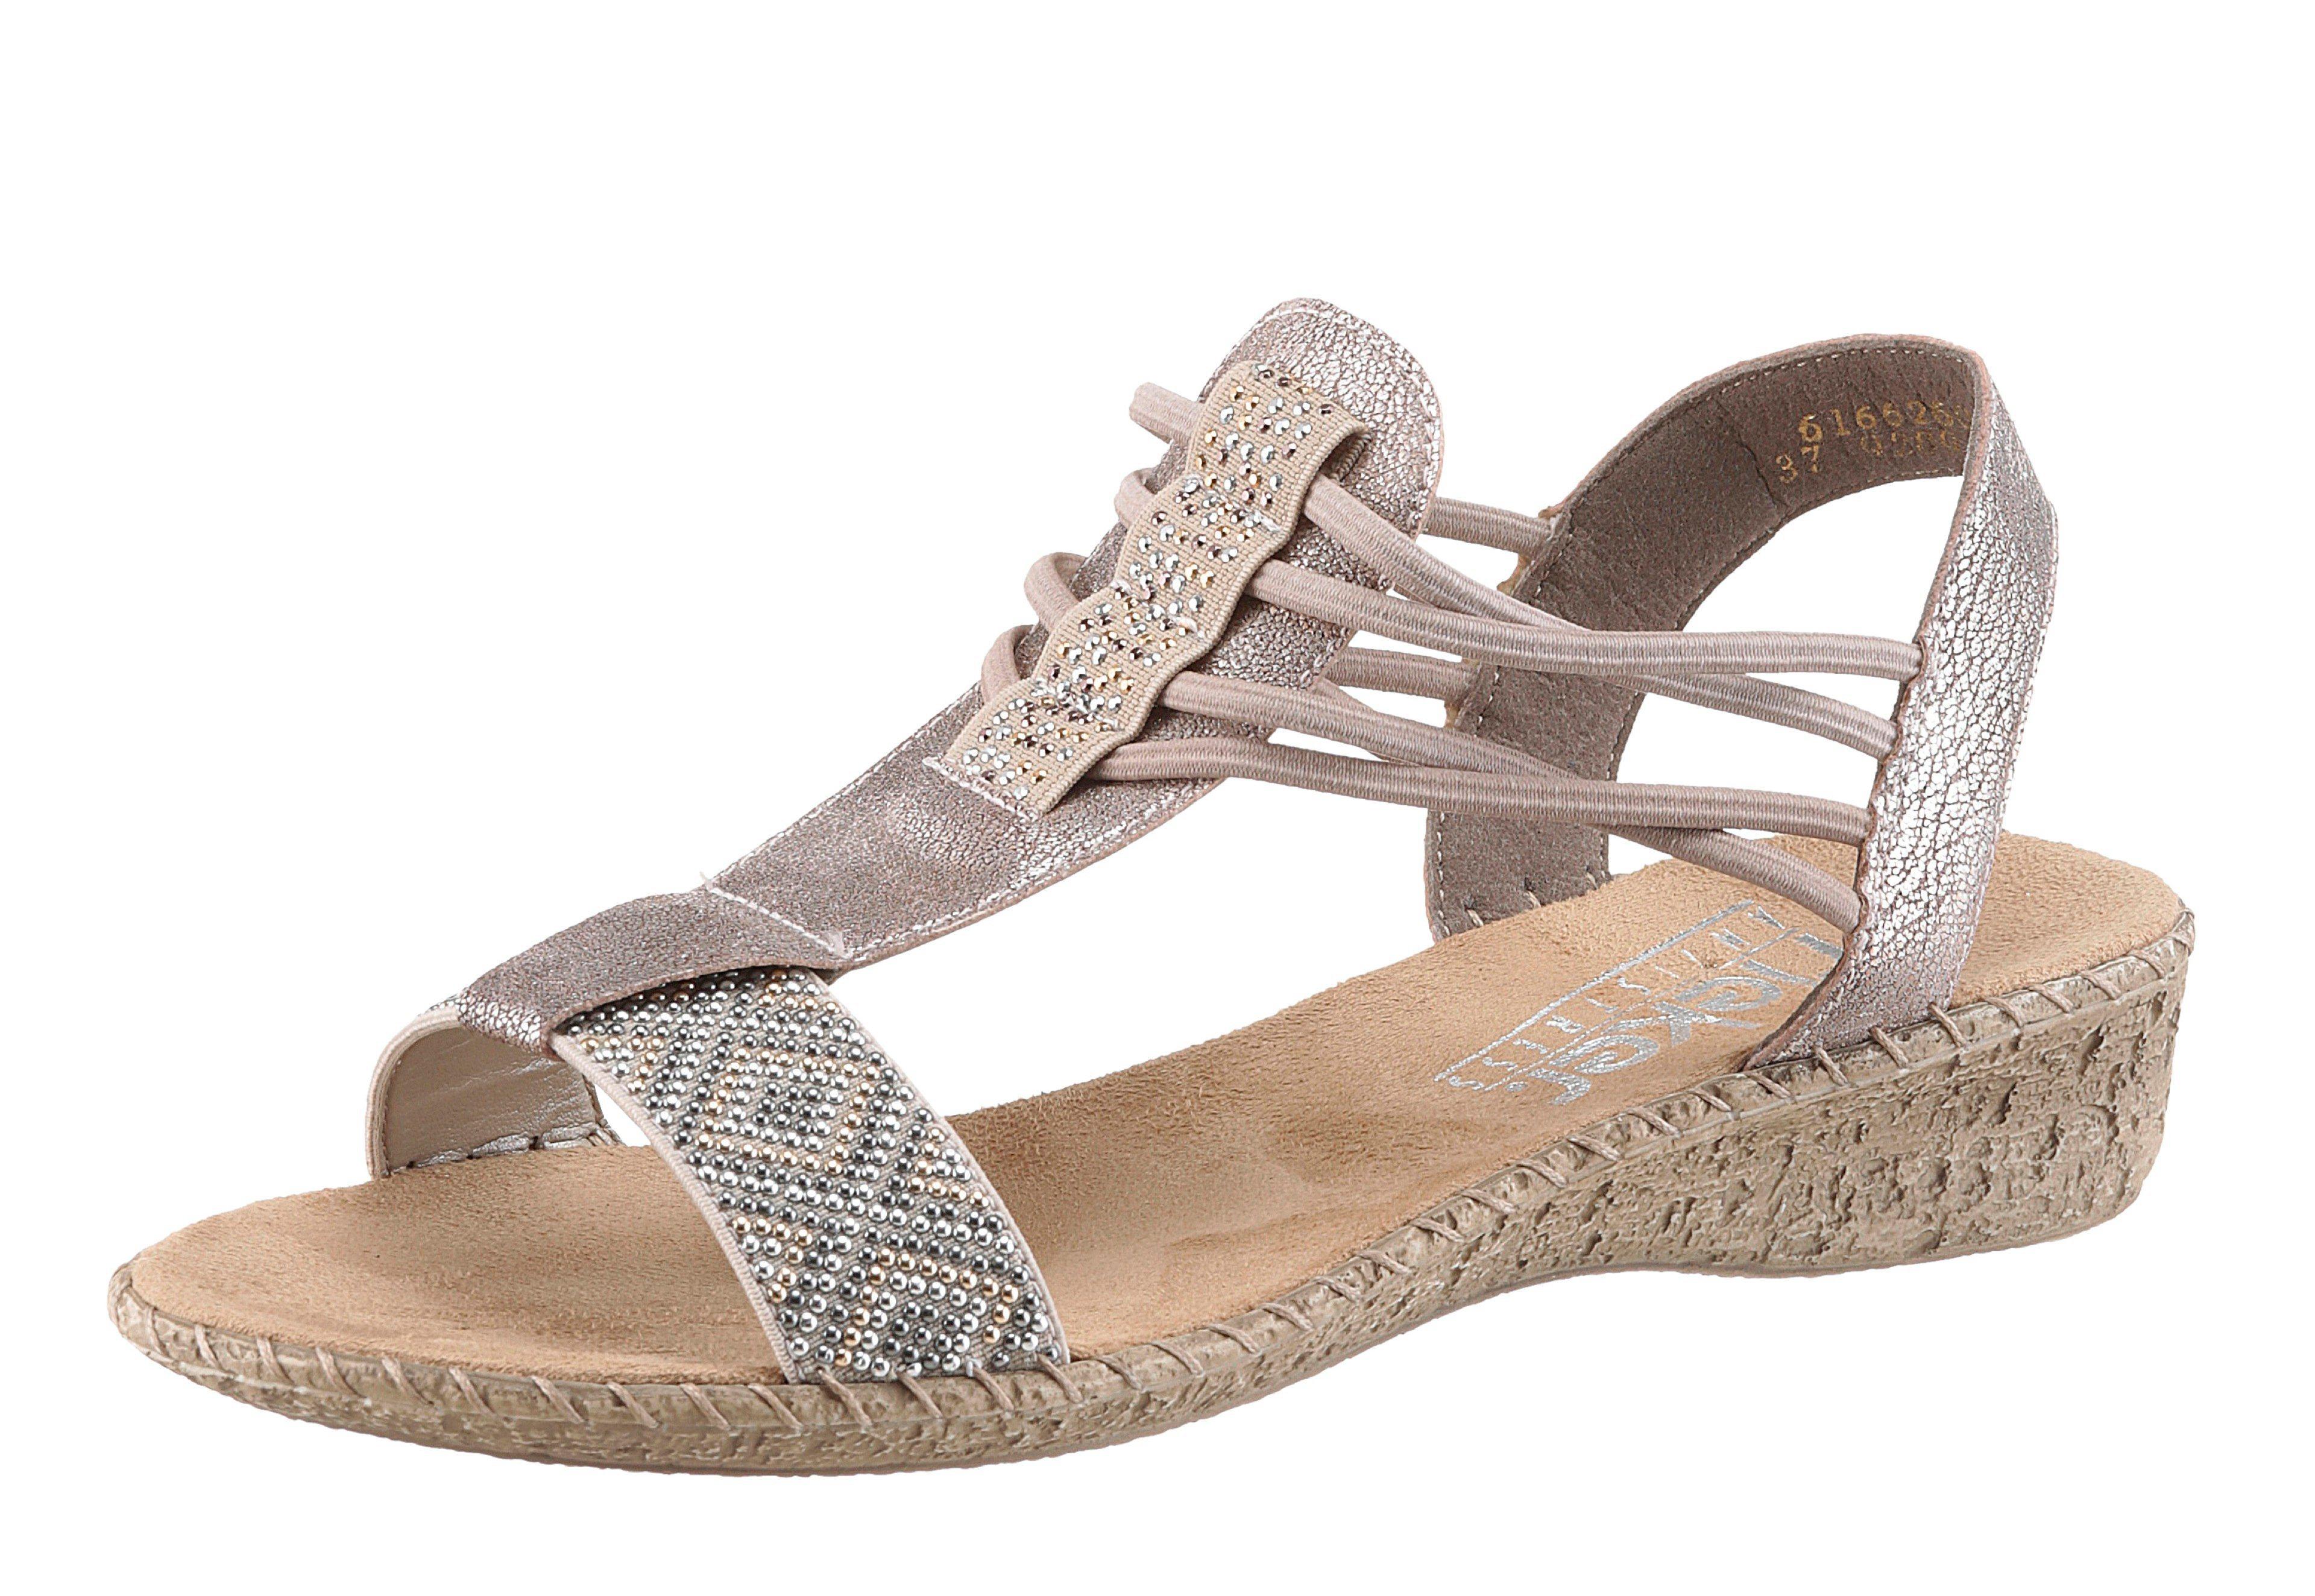 Rieker Riemchensandale in Metallic-Optik   Schuhe > Sandalen & Zehentrenner > Sandalen   Rieker